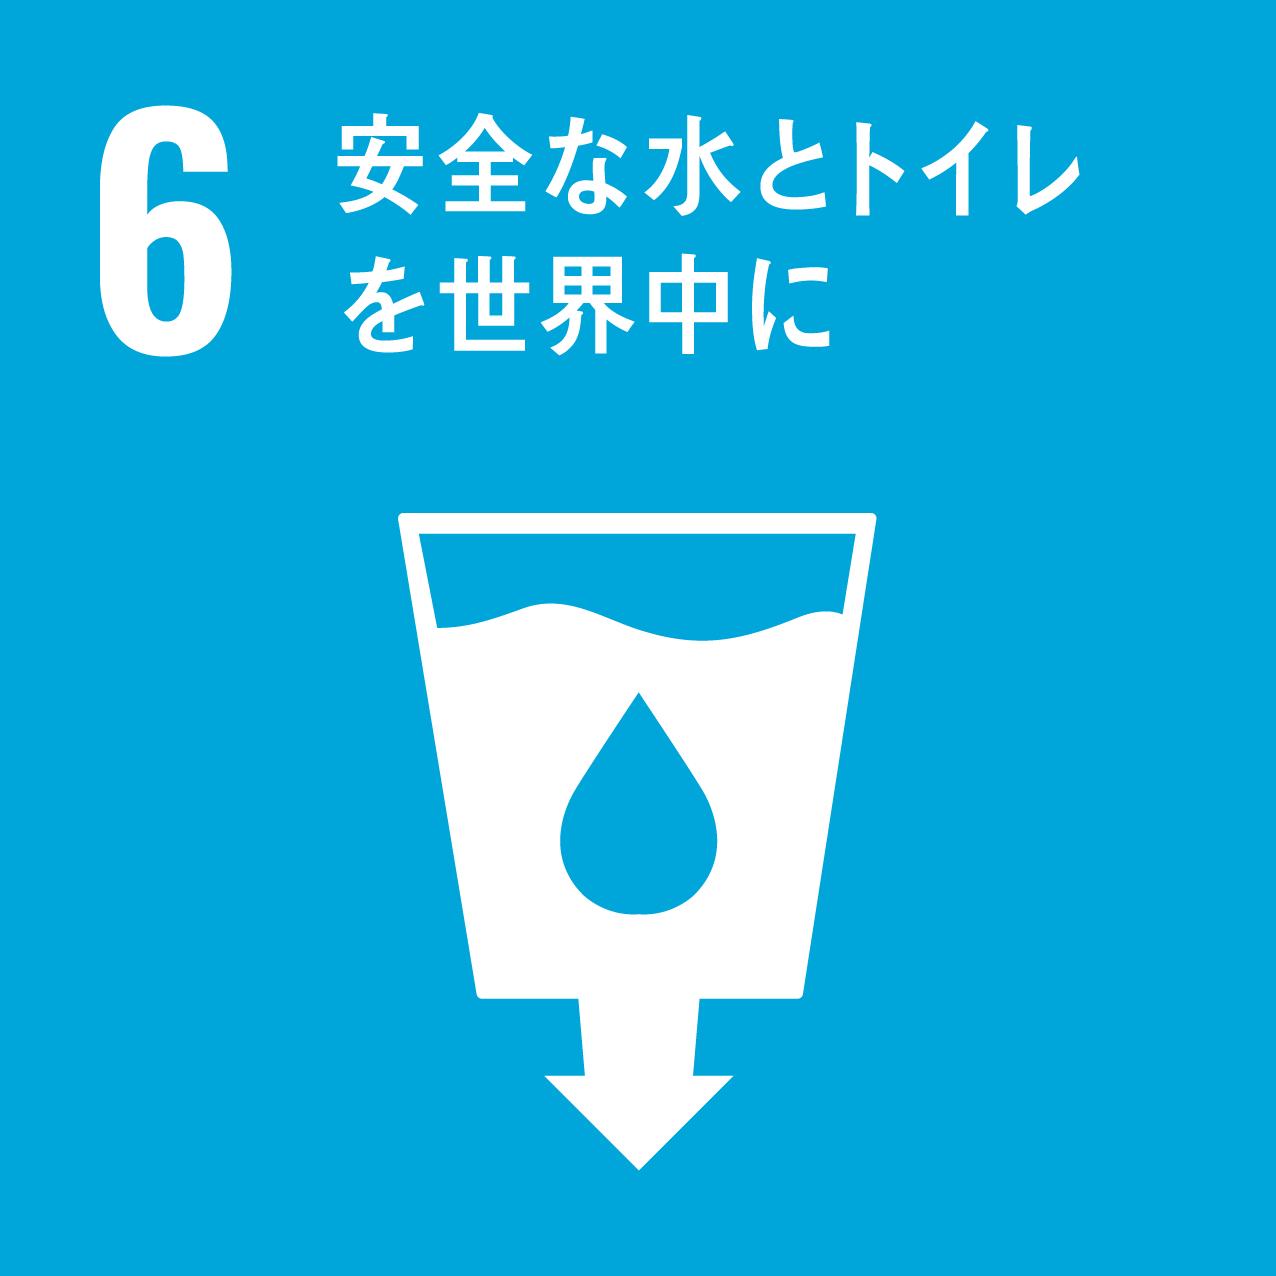 SDGs 6.安全なトイレを世界中に